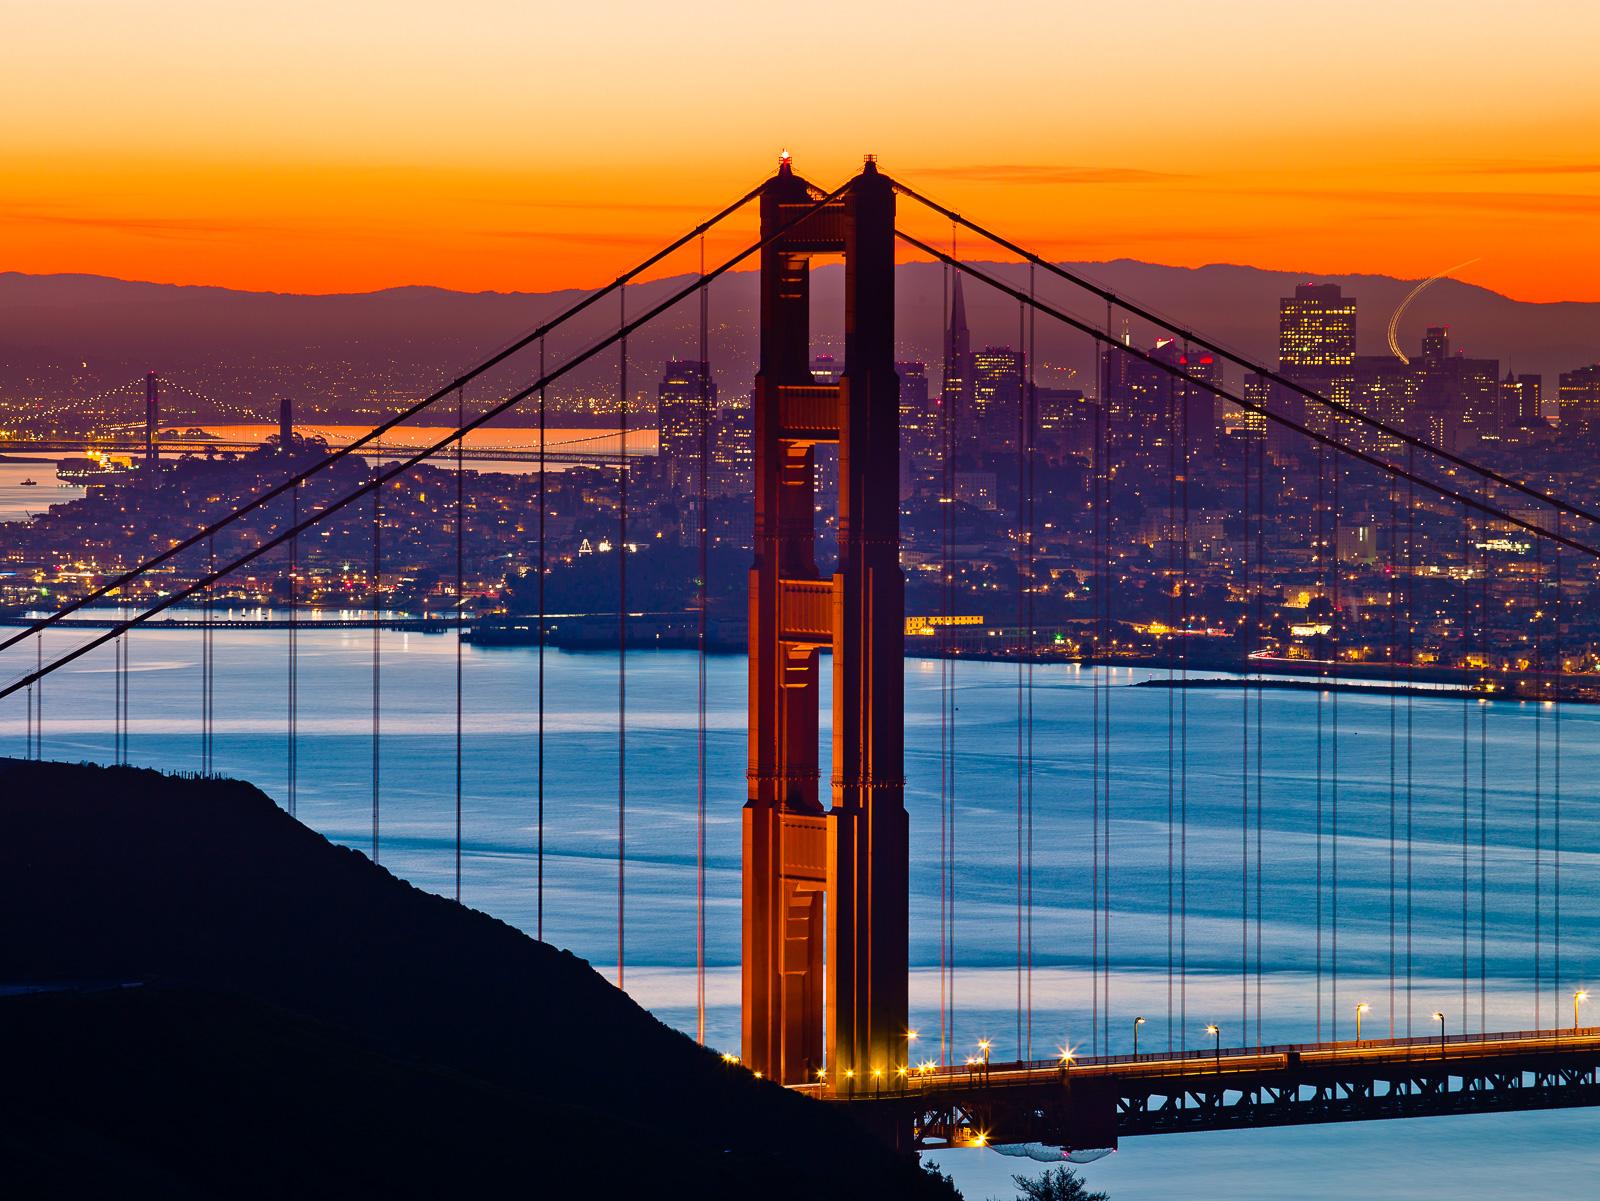 Bridge,California,Golden Gate,TowerBridge,Horizontal,Orange,San Francisco,blue,cityscape,landscape,pacific ocean,sunrise, photo